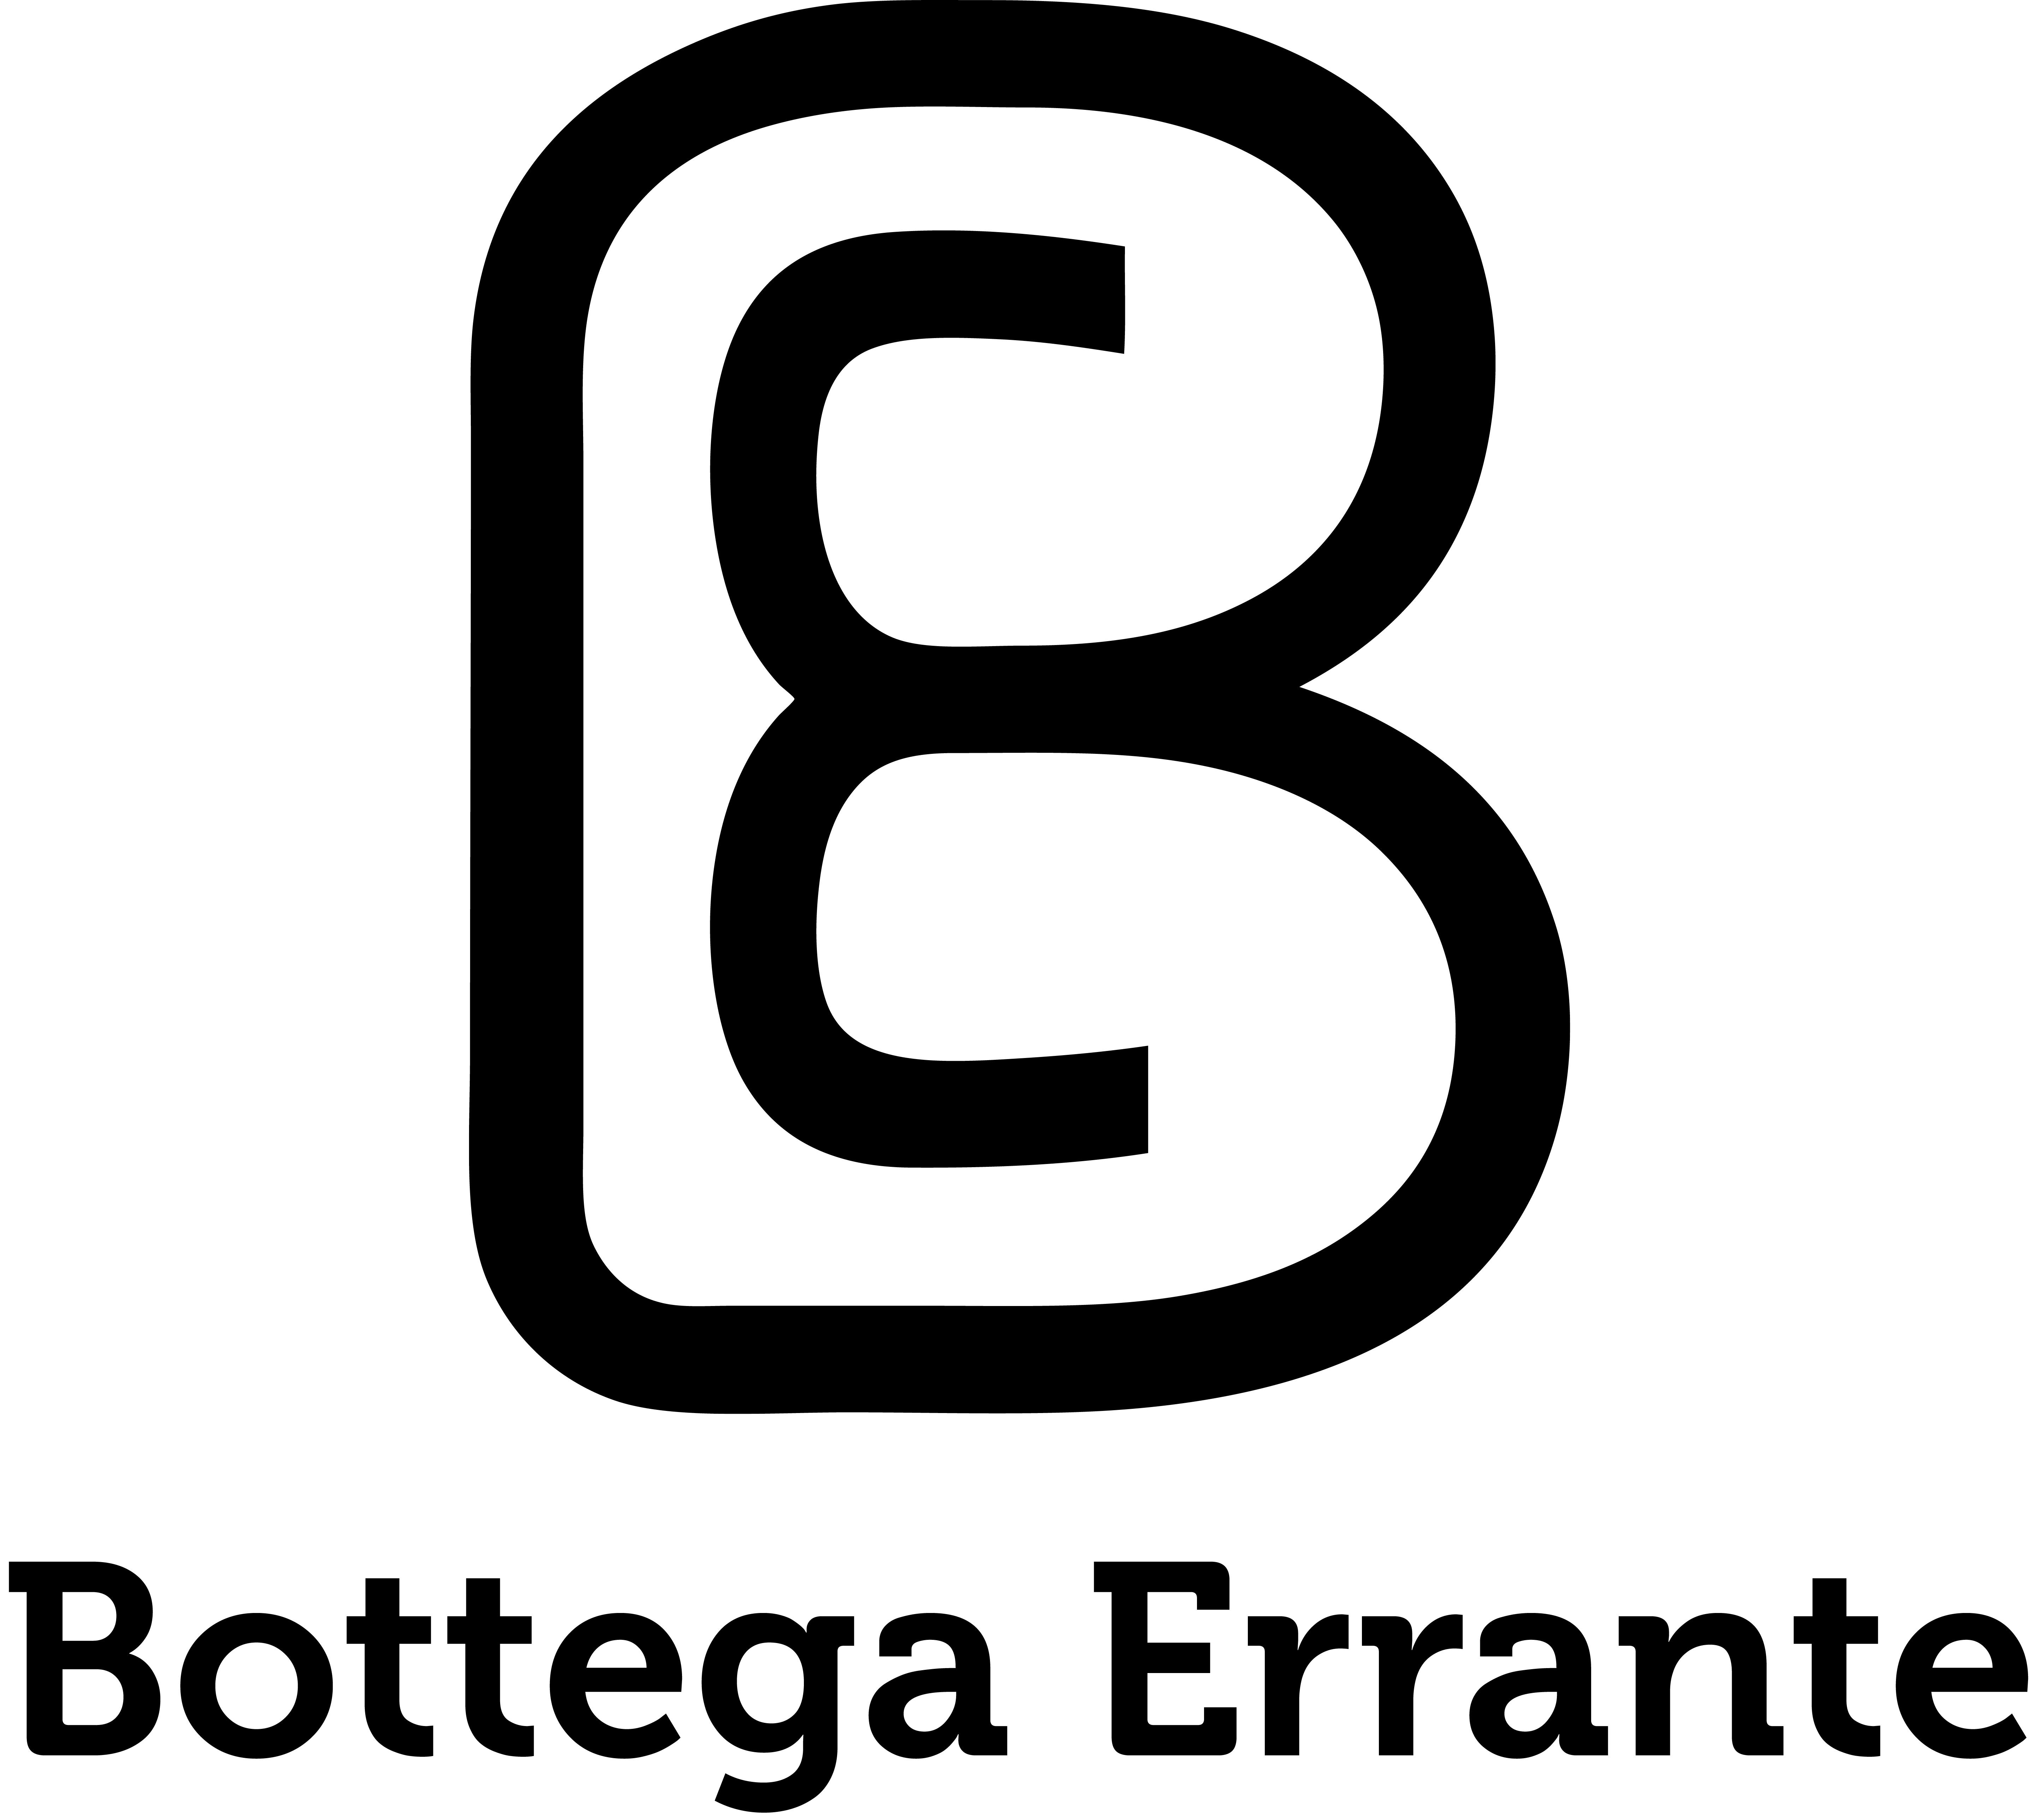 LOGO_Bottega Errante_black OK